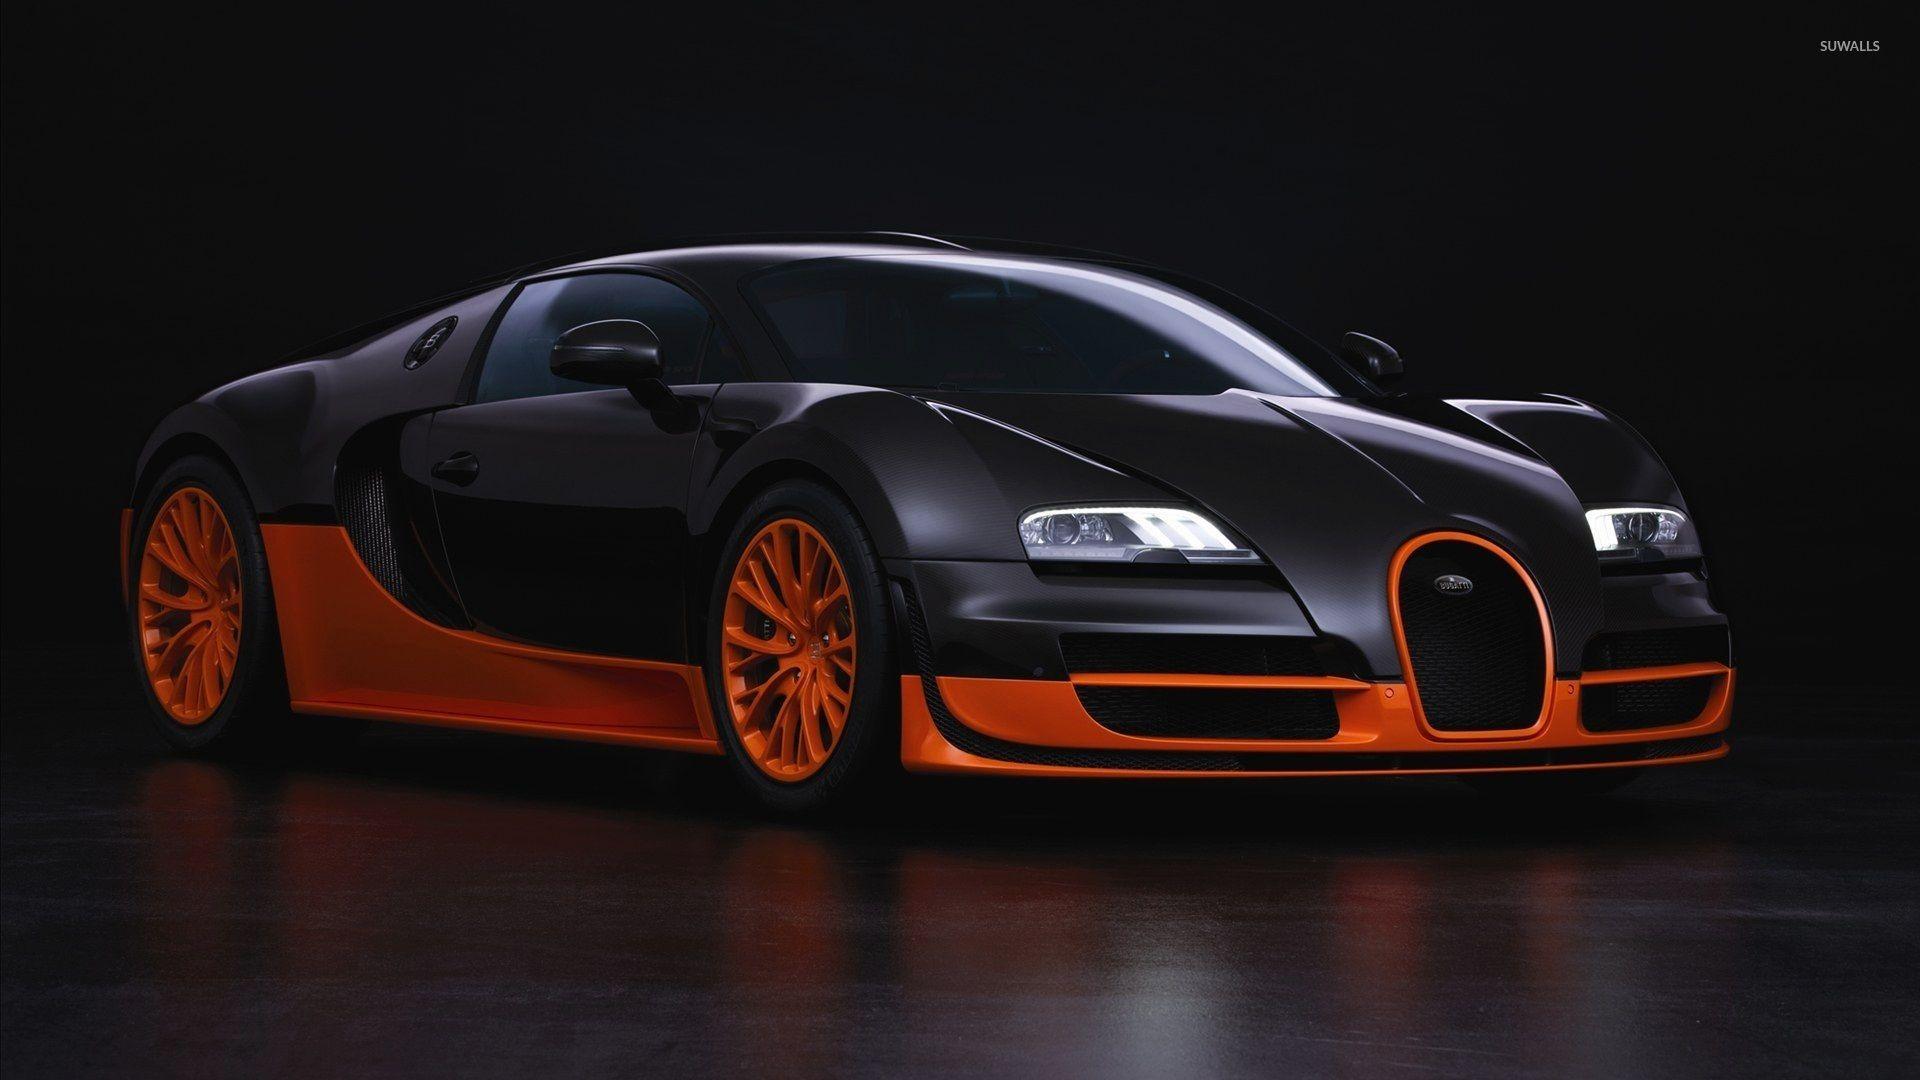 Bugatti 3D Wallpapers - Top Free Bugatti 3D Backgrounds ...